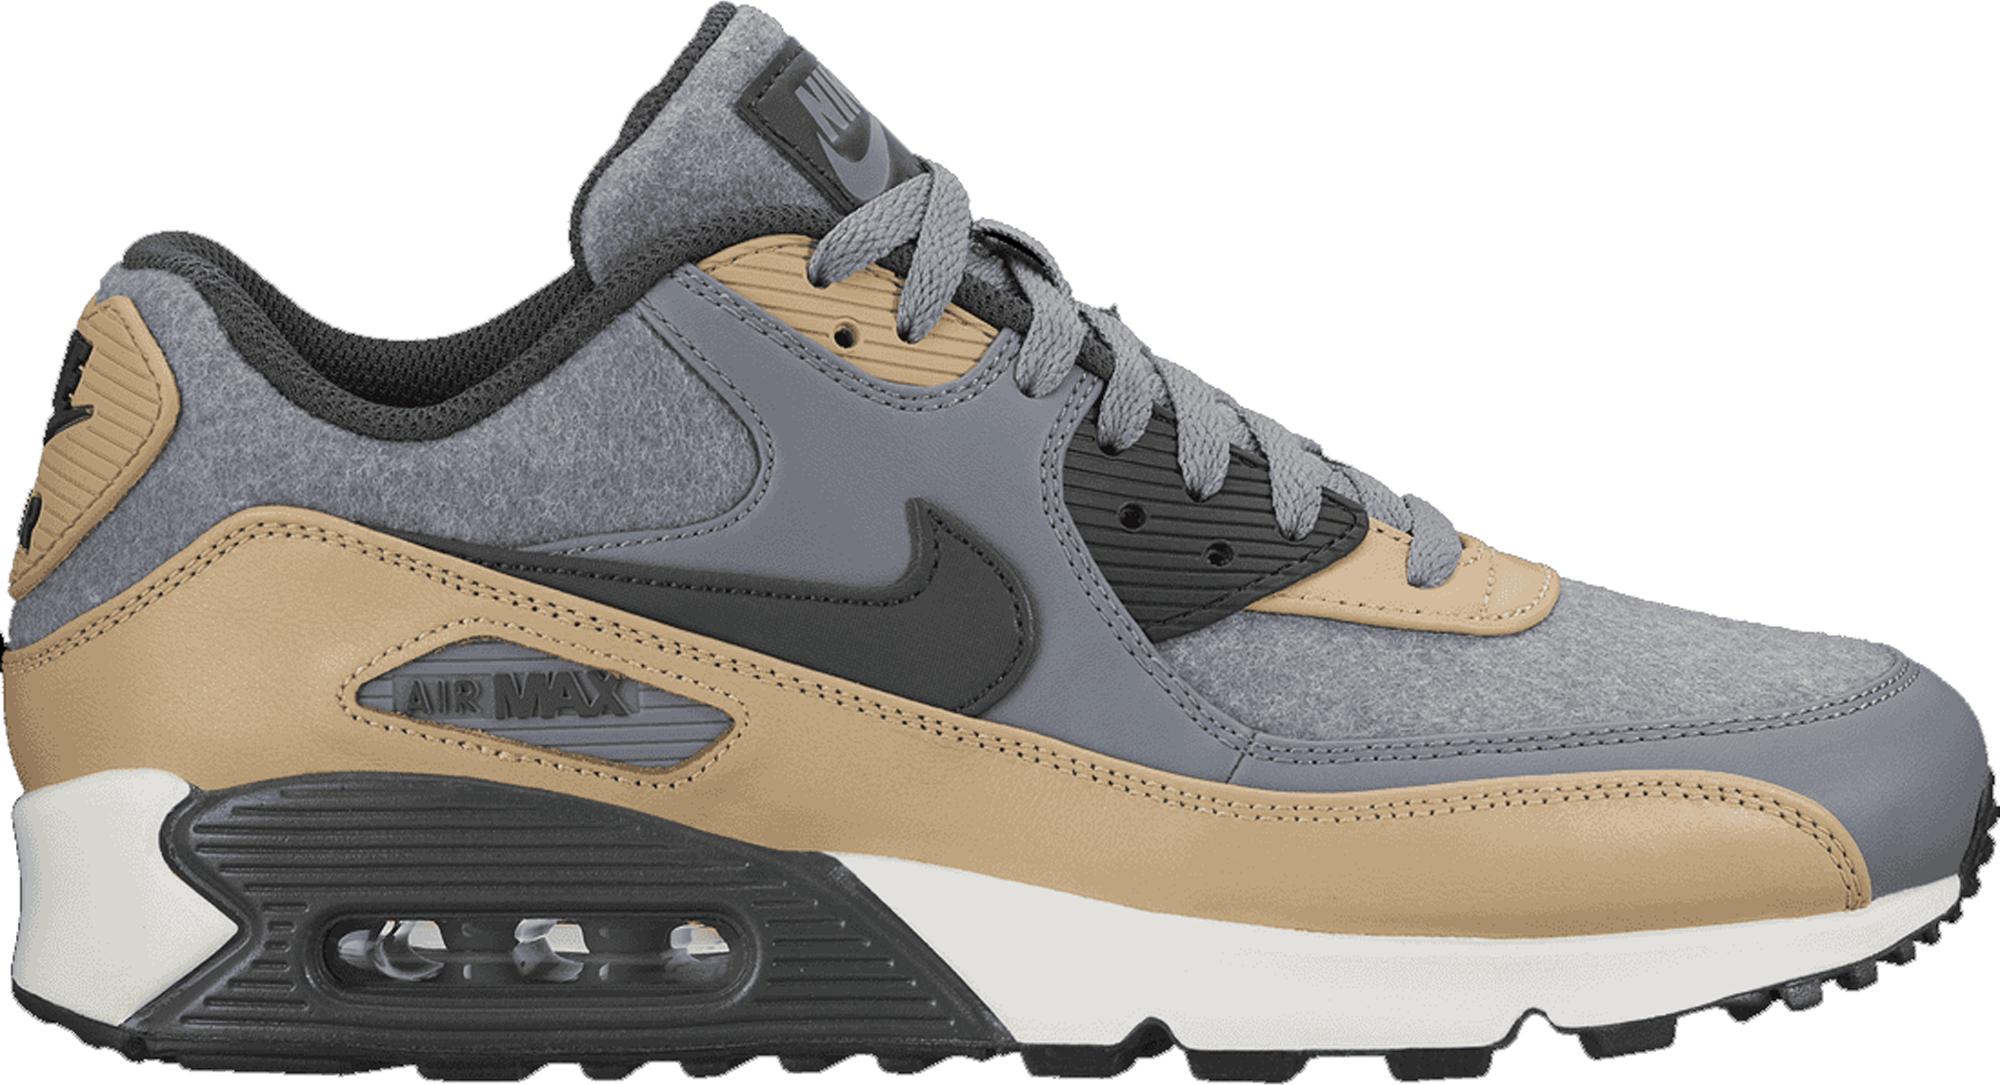 Nike Air Max 90 Wool Cool Grey Mushroom